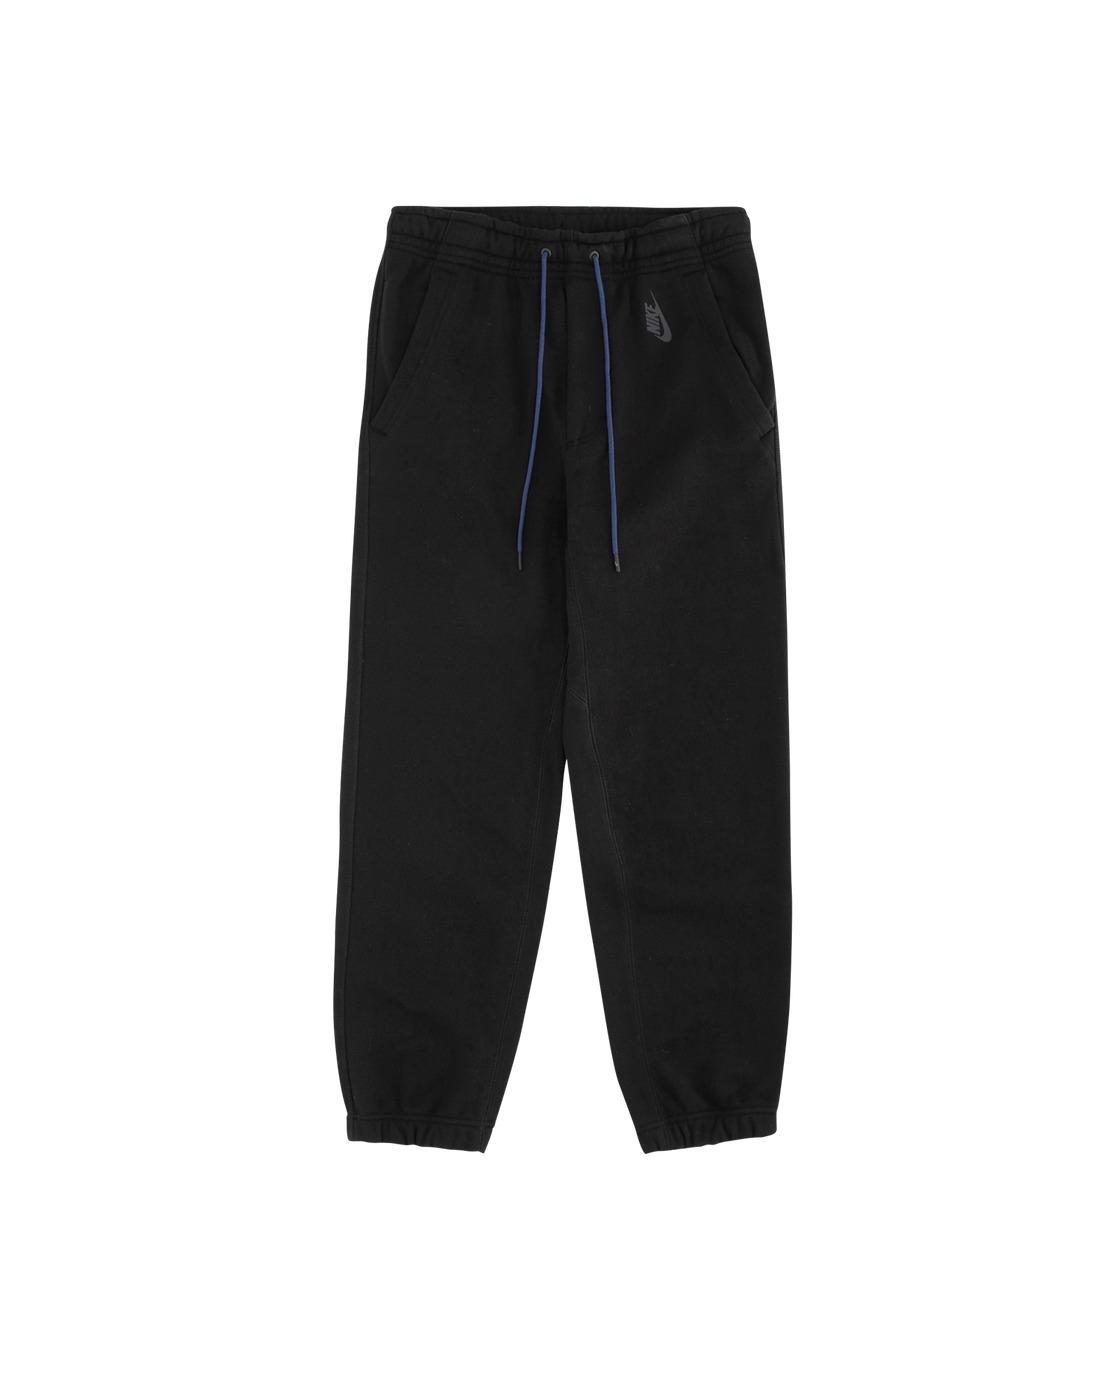 Nike Special Project Fleece Pants Black/Black